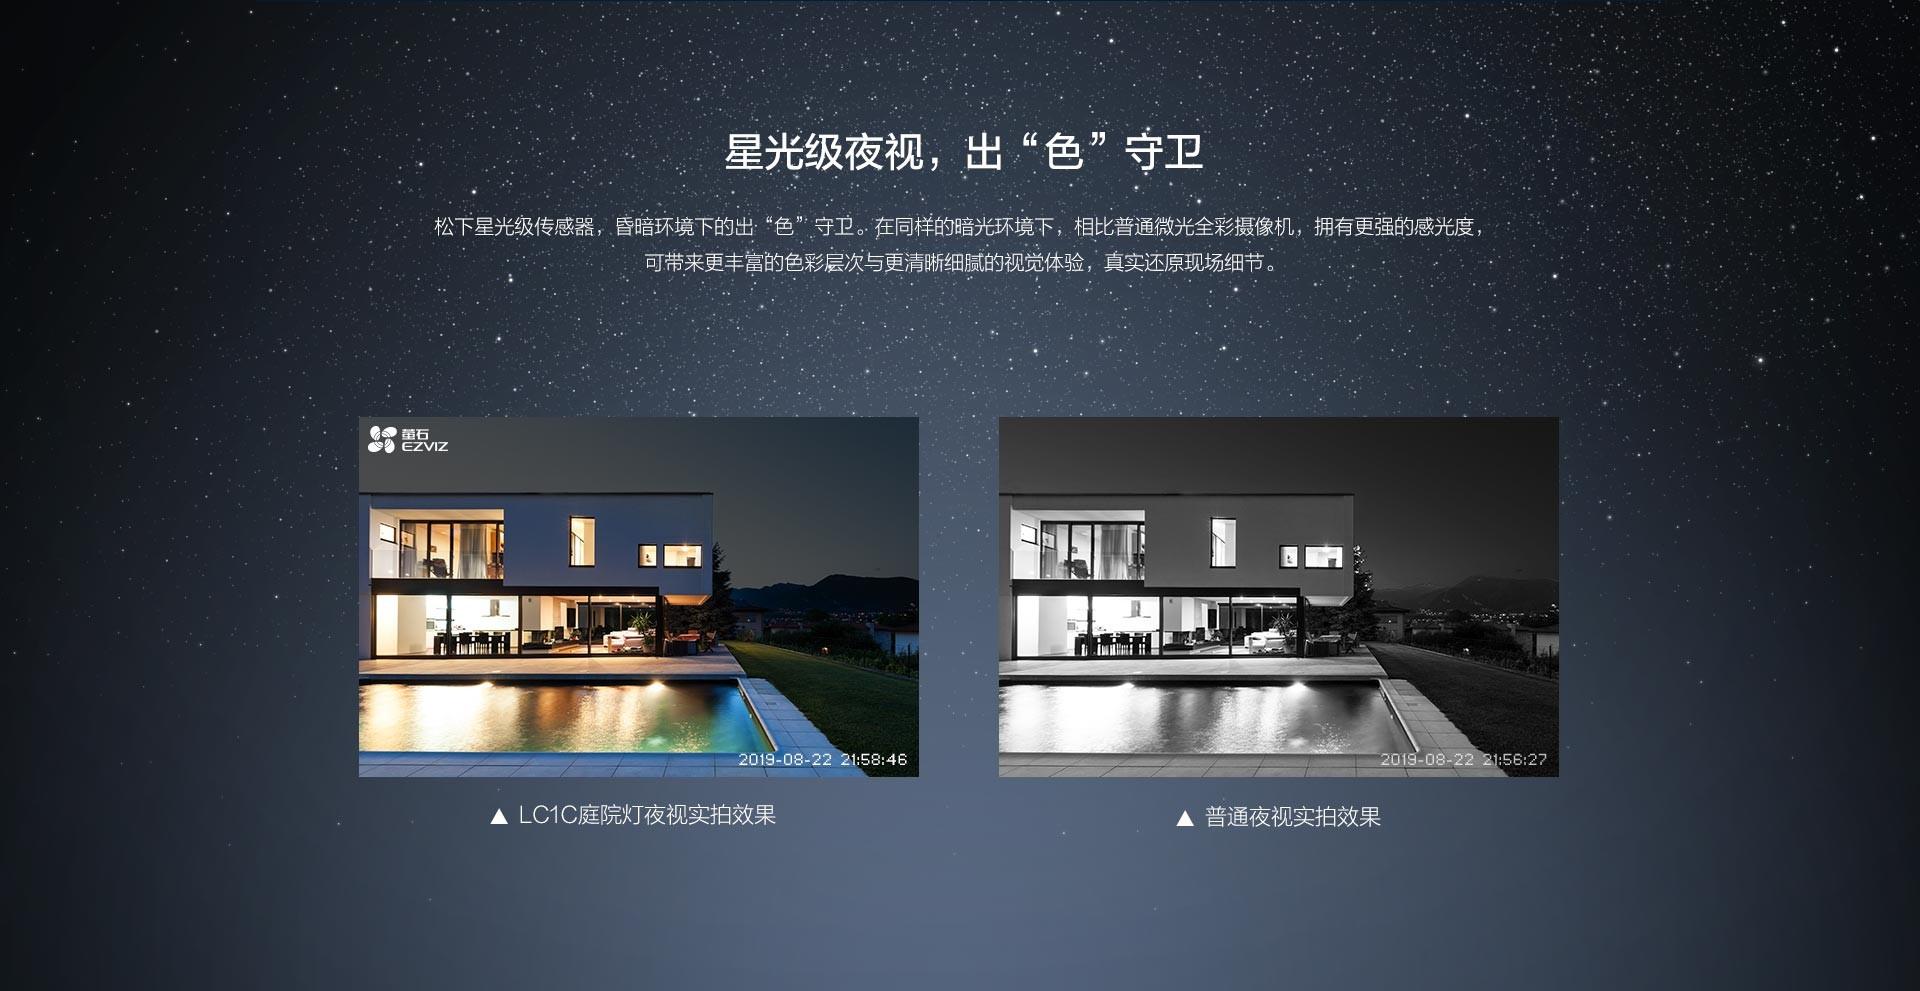 LC1C-web1_03.jpg